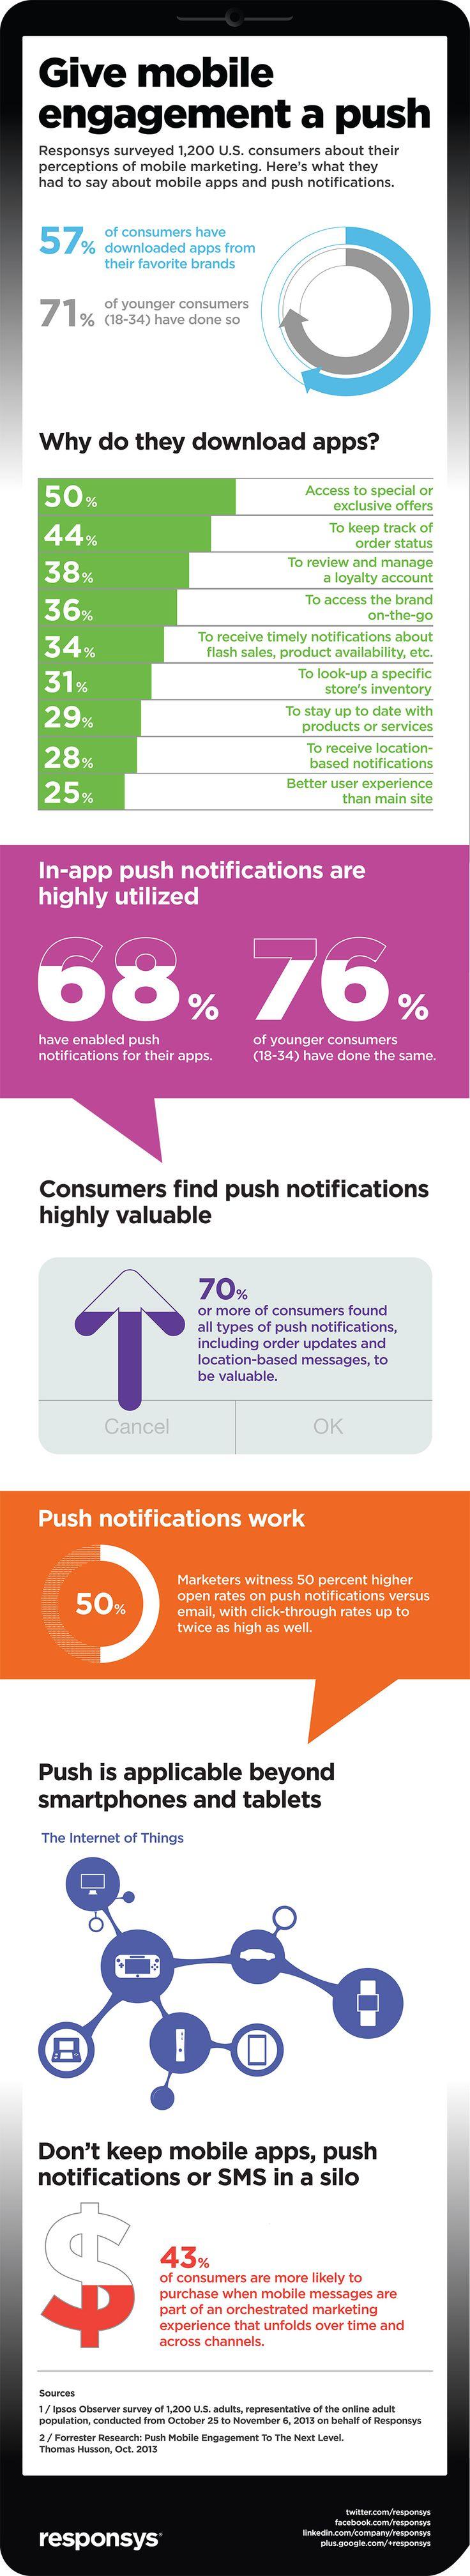 1391714048-mobile-marketing-magic-push-notifications-infographic